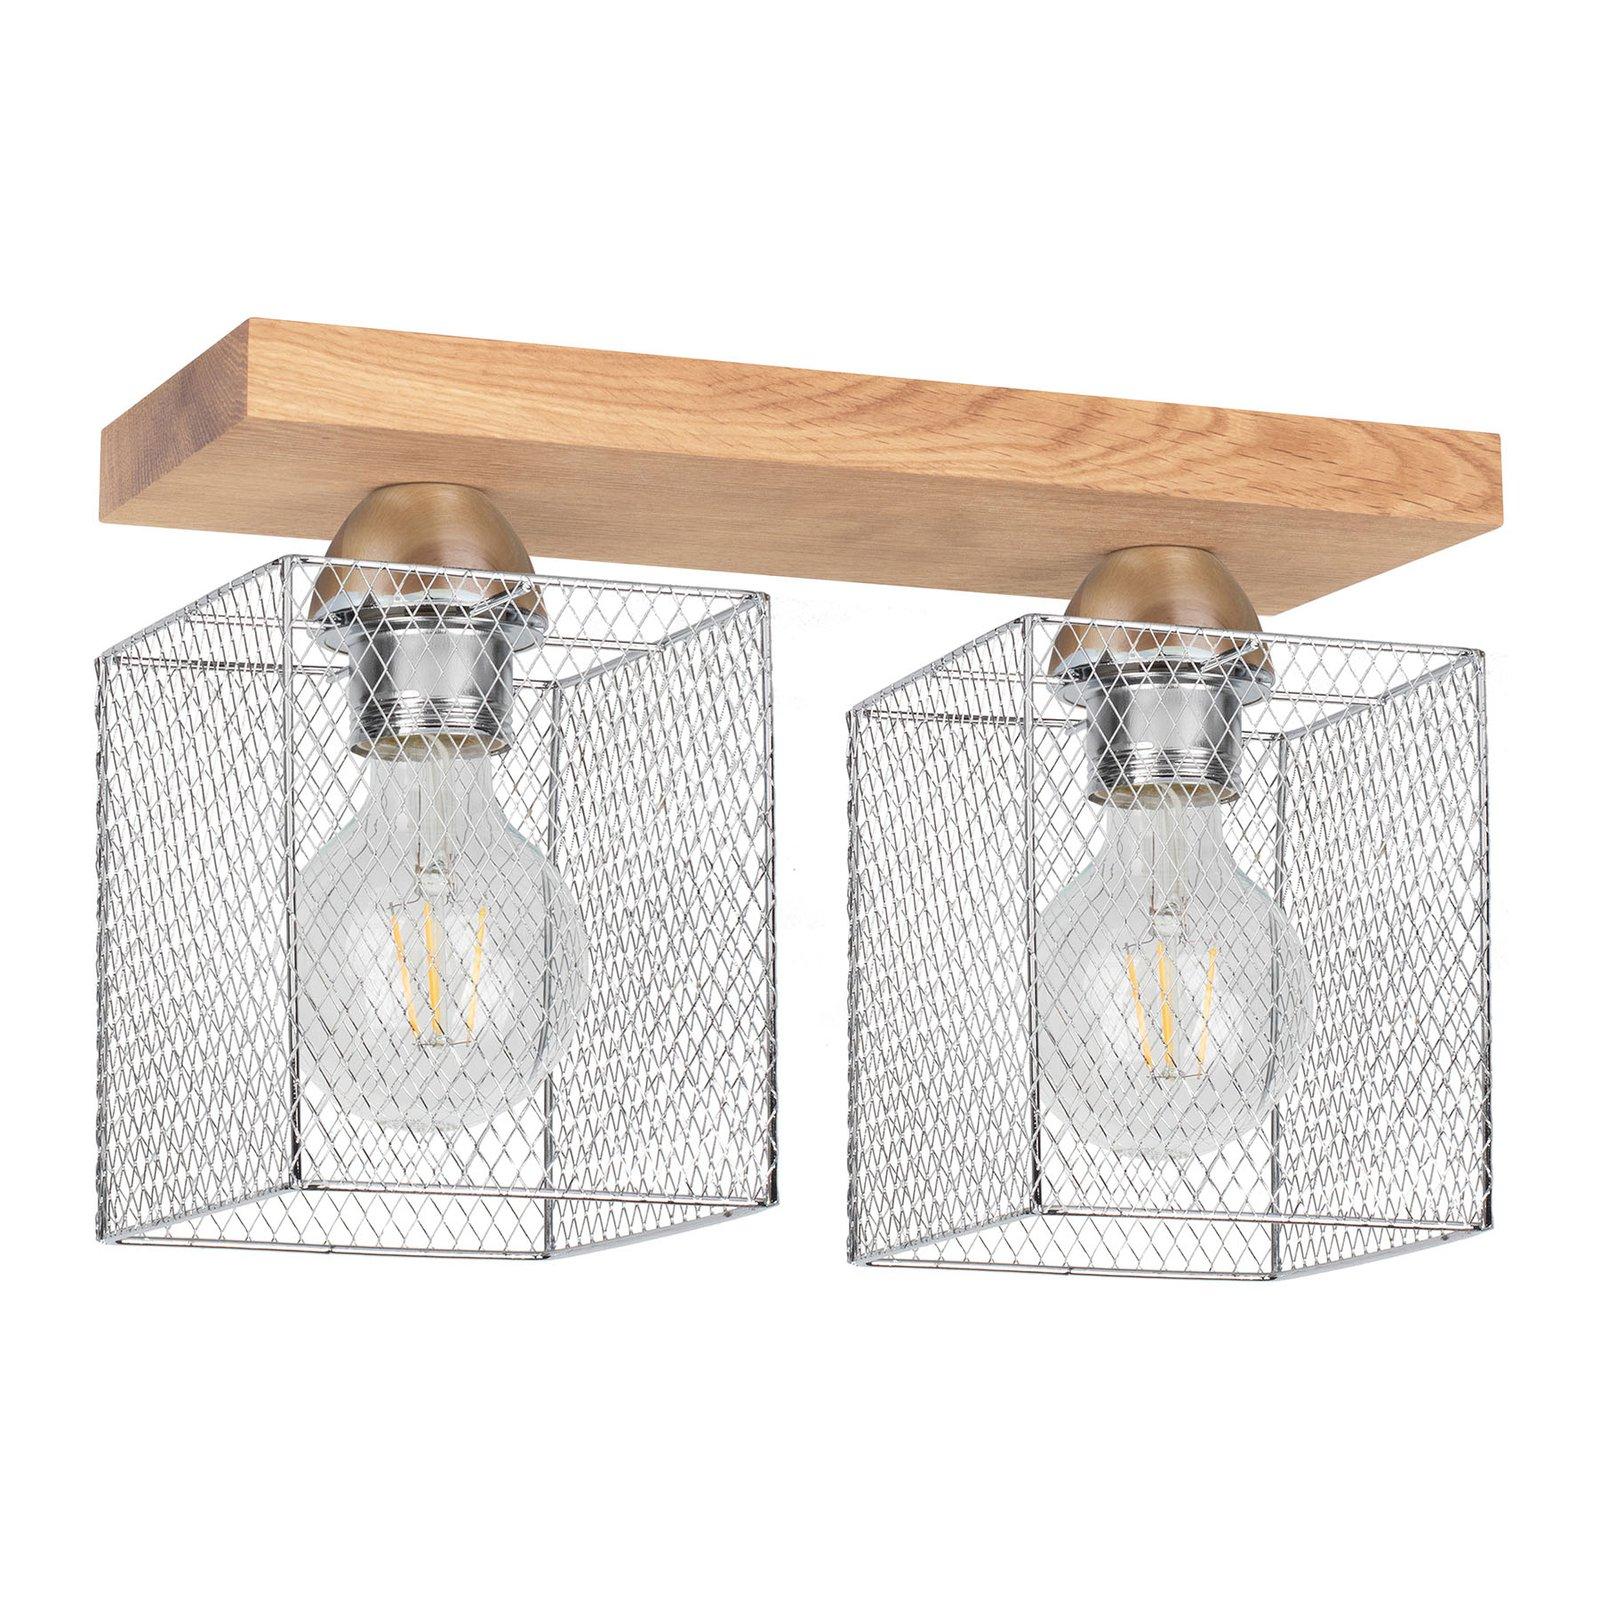 Taklampe Norman Wood 2 lyskilder, oljet eik